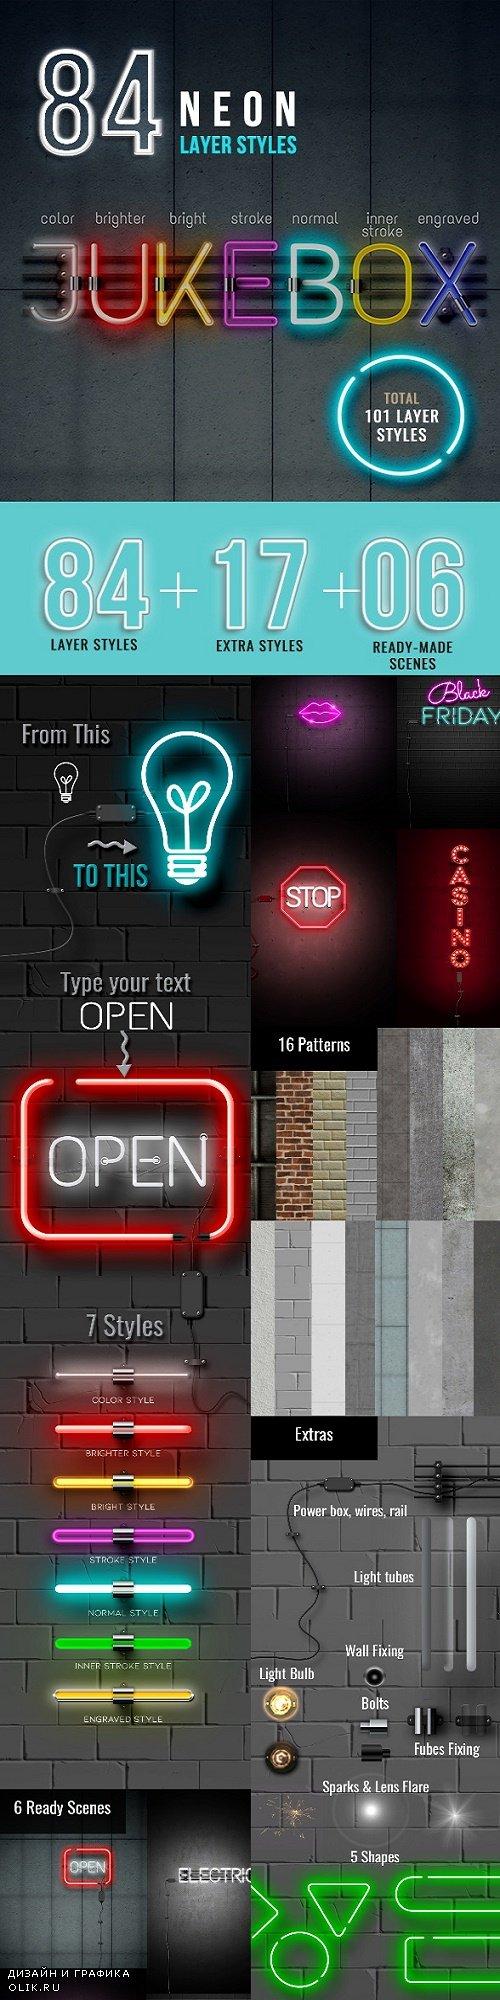 Neon Sign Styles Creator - 23937432